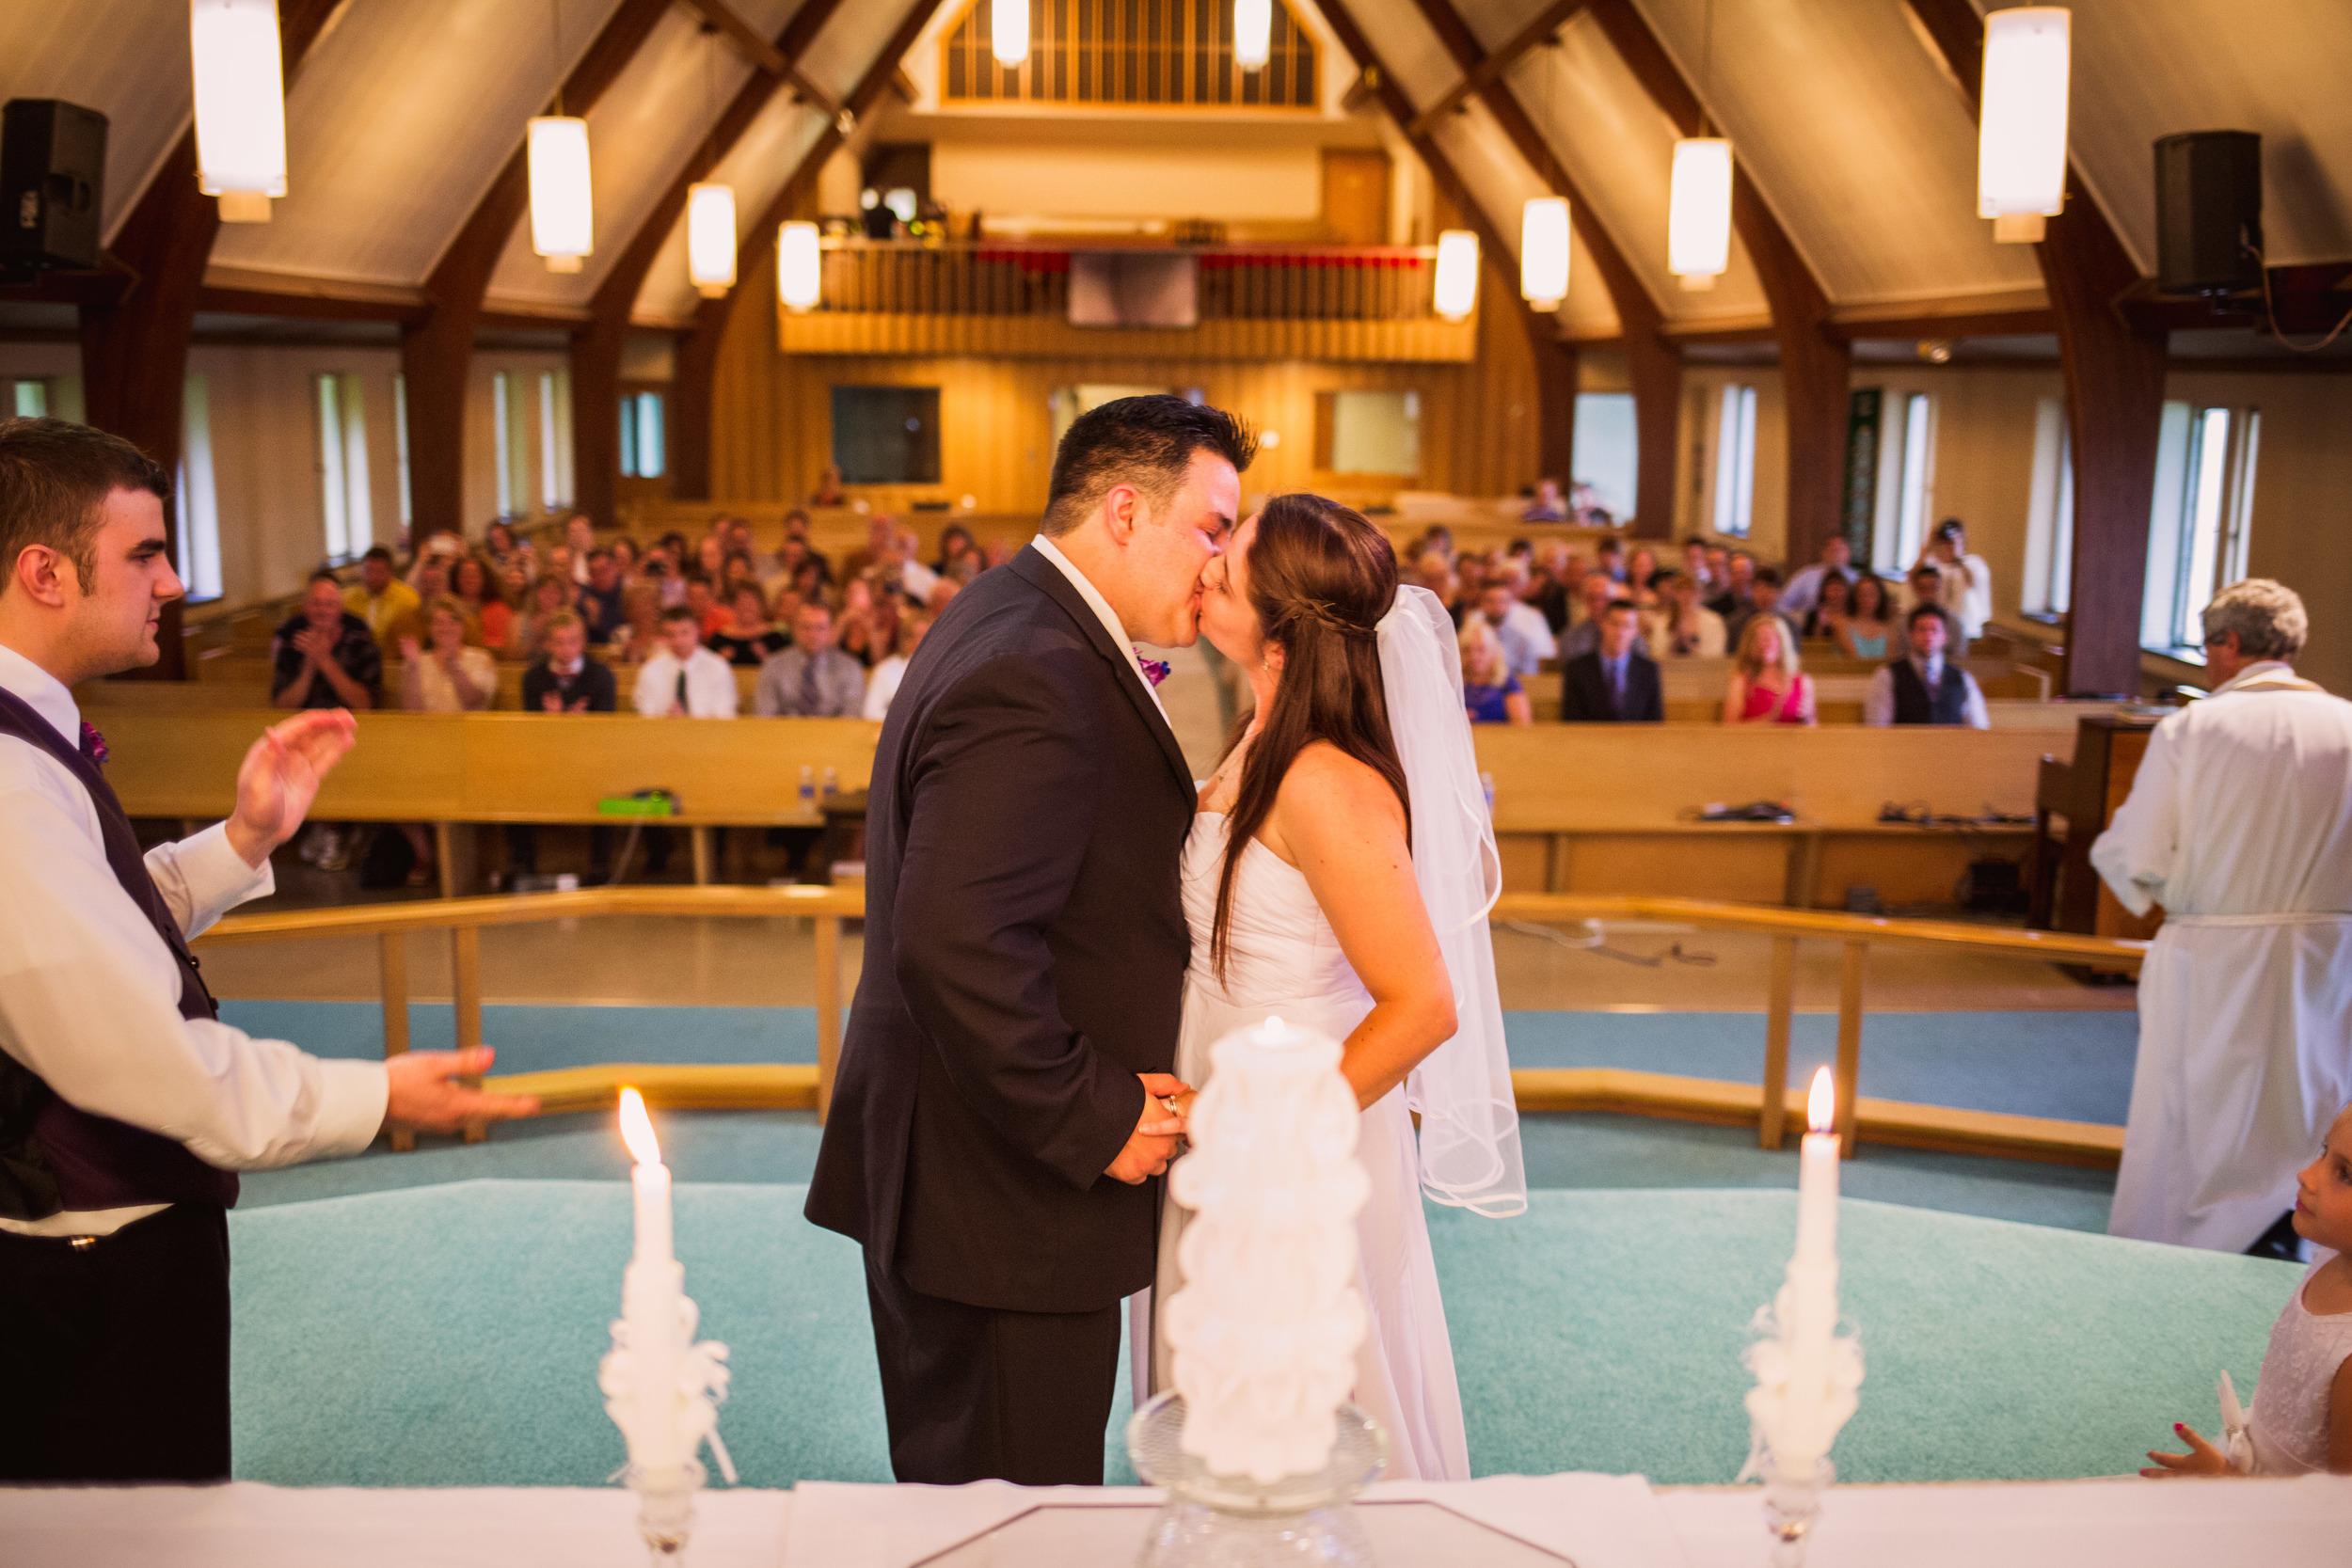 Stephanie-and-Mitchell-Buffalo-NY-Wedding-Stefan-Ludwig-Photography-160.jpg